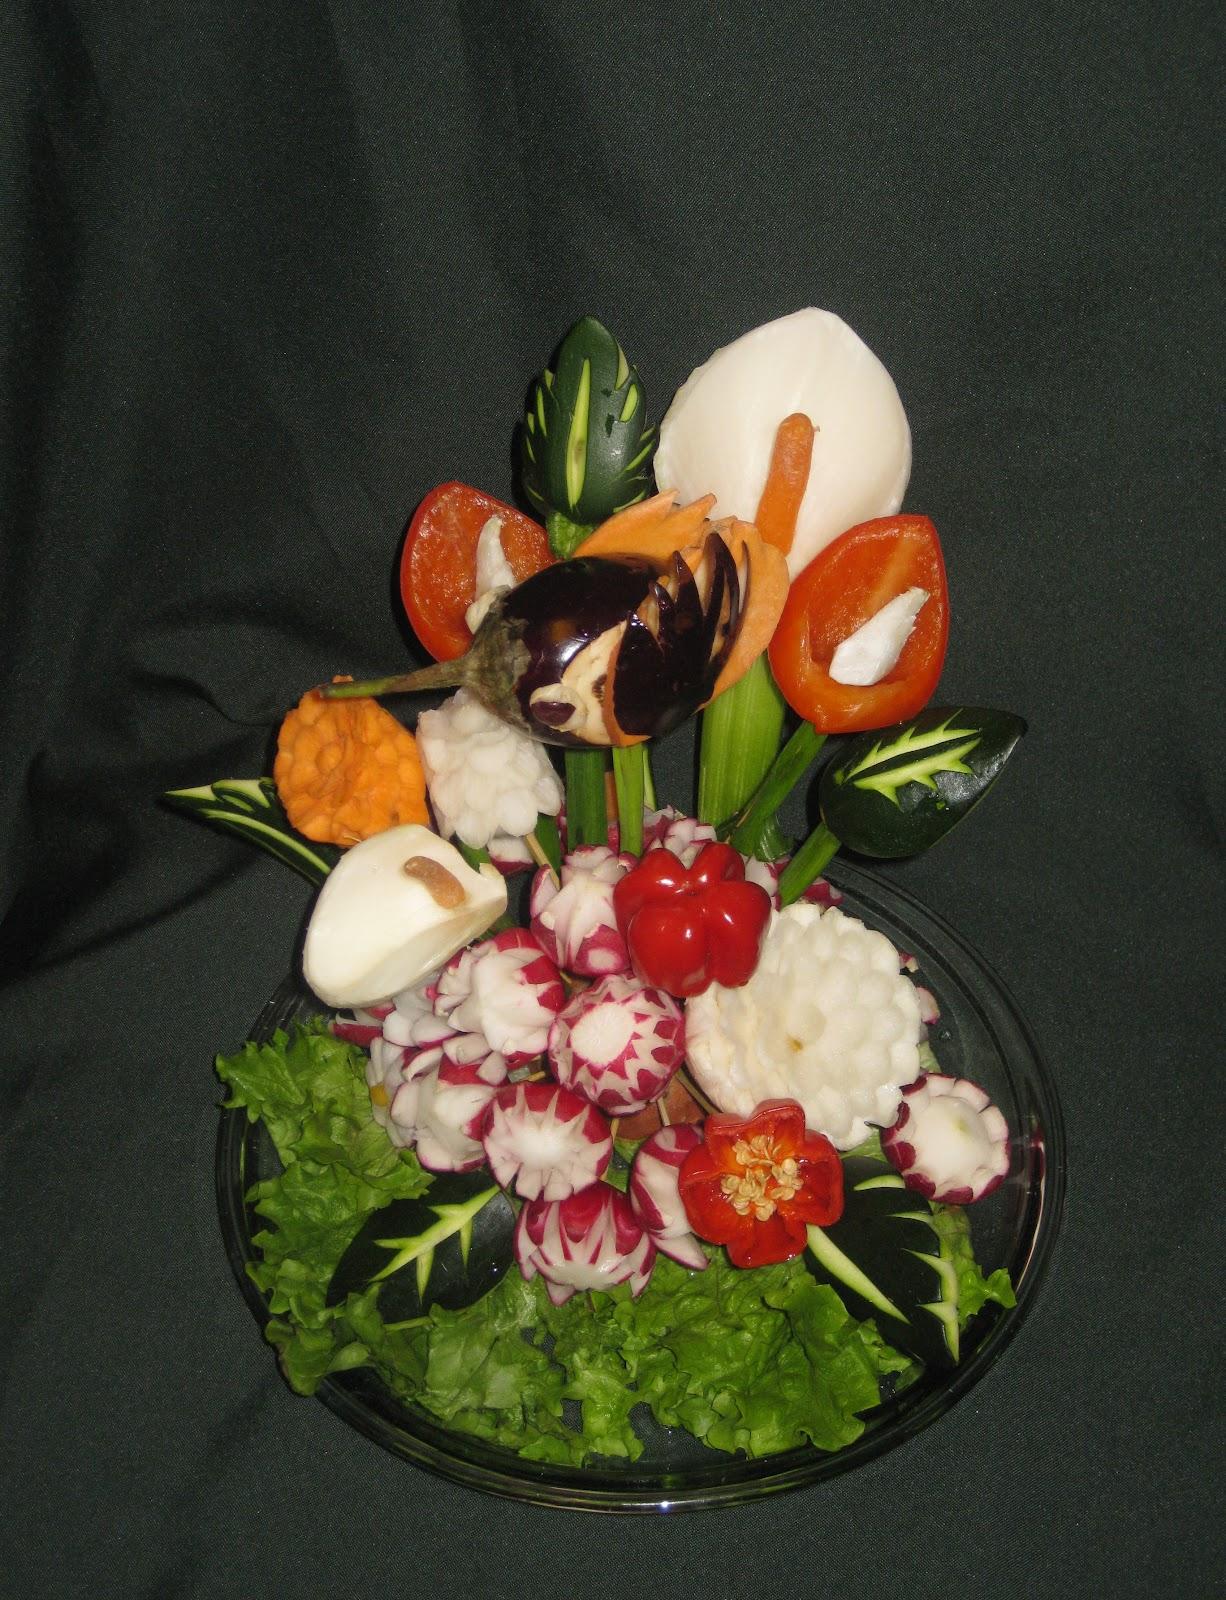 Fruit platter can say it edible fruit and vegetable arrangements